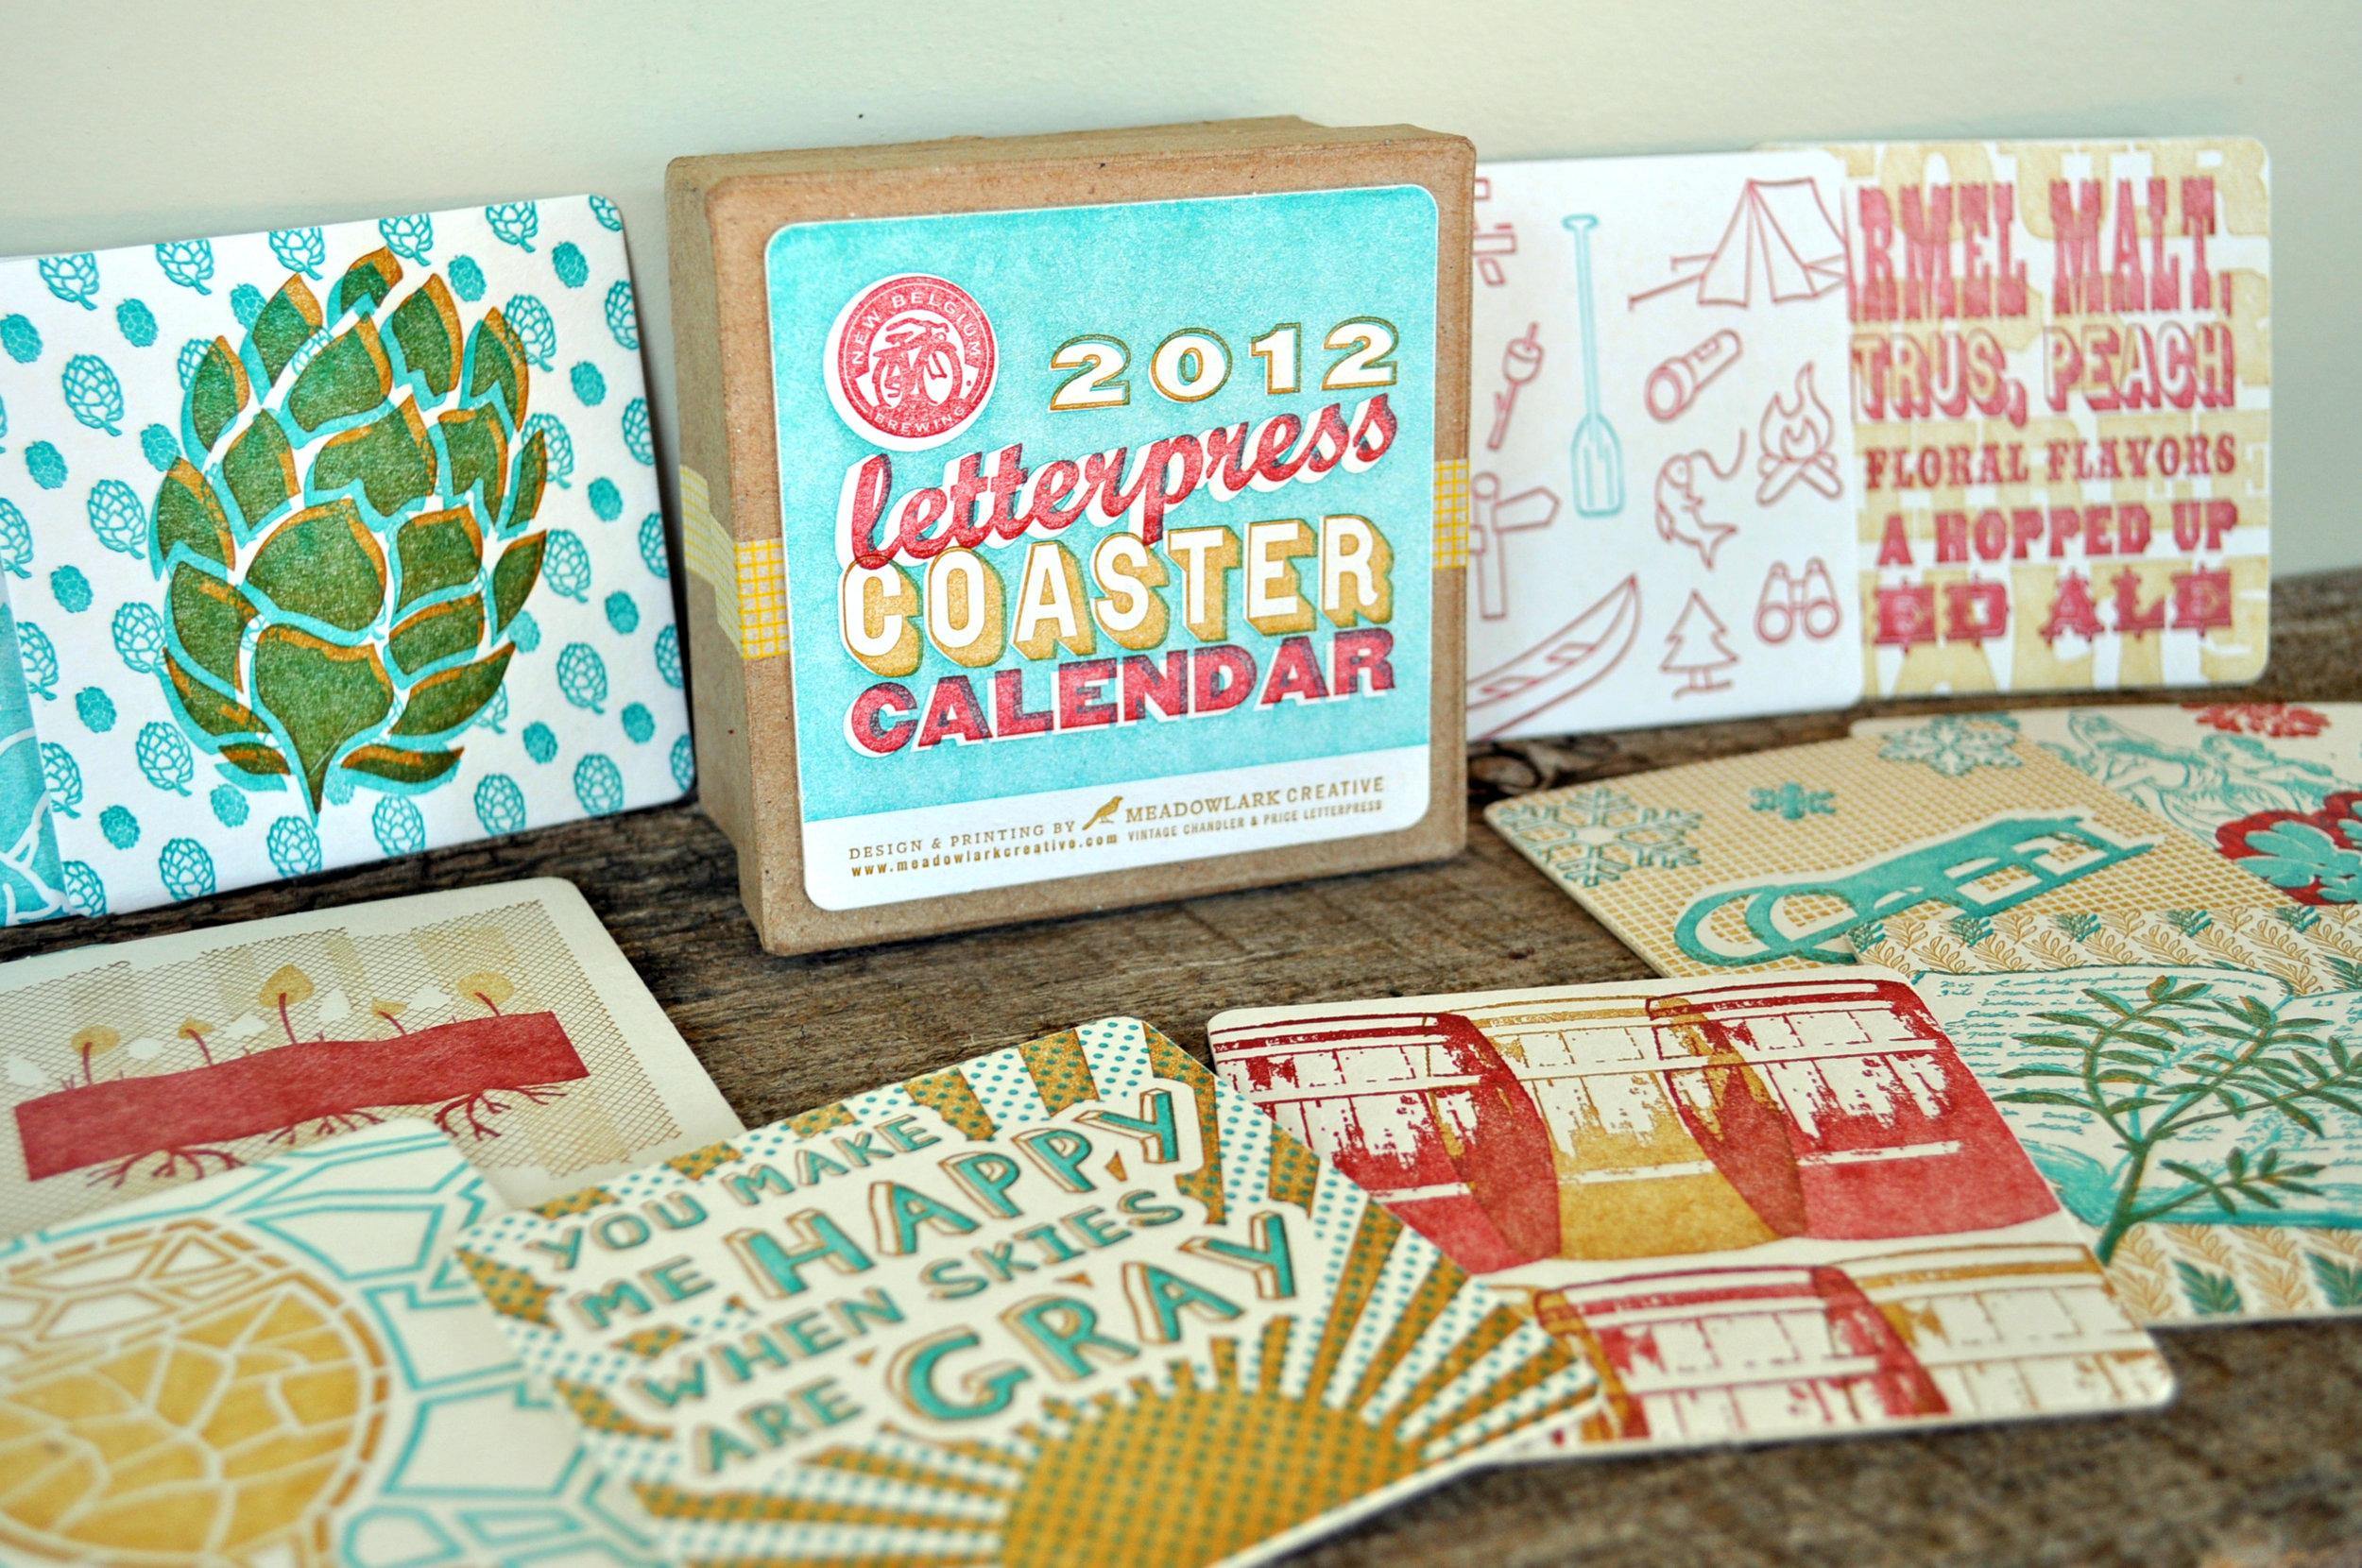 letterpress-coaster-calendar-2012-6.JPG